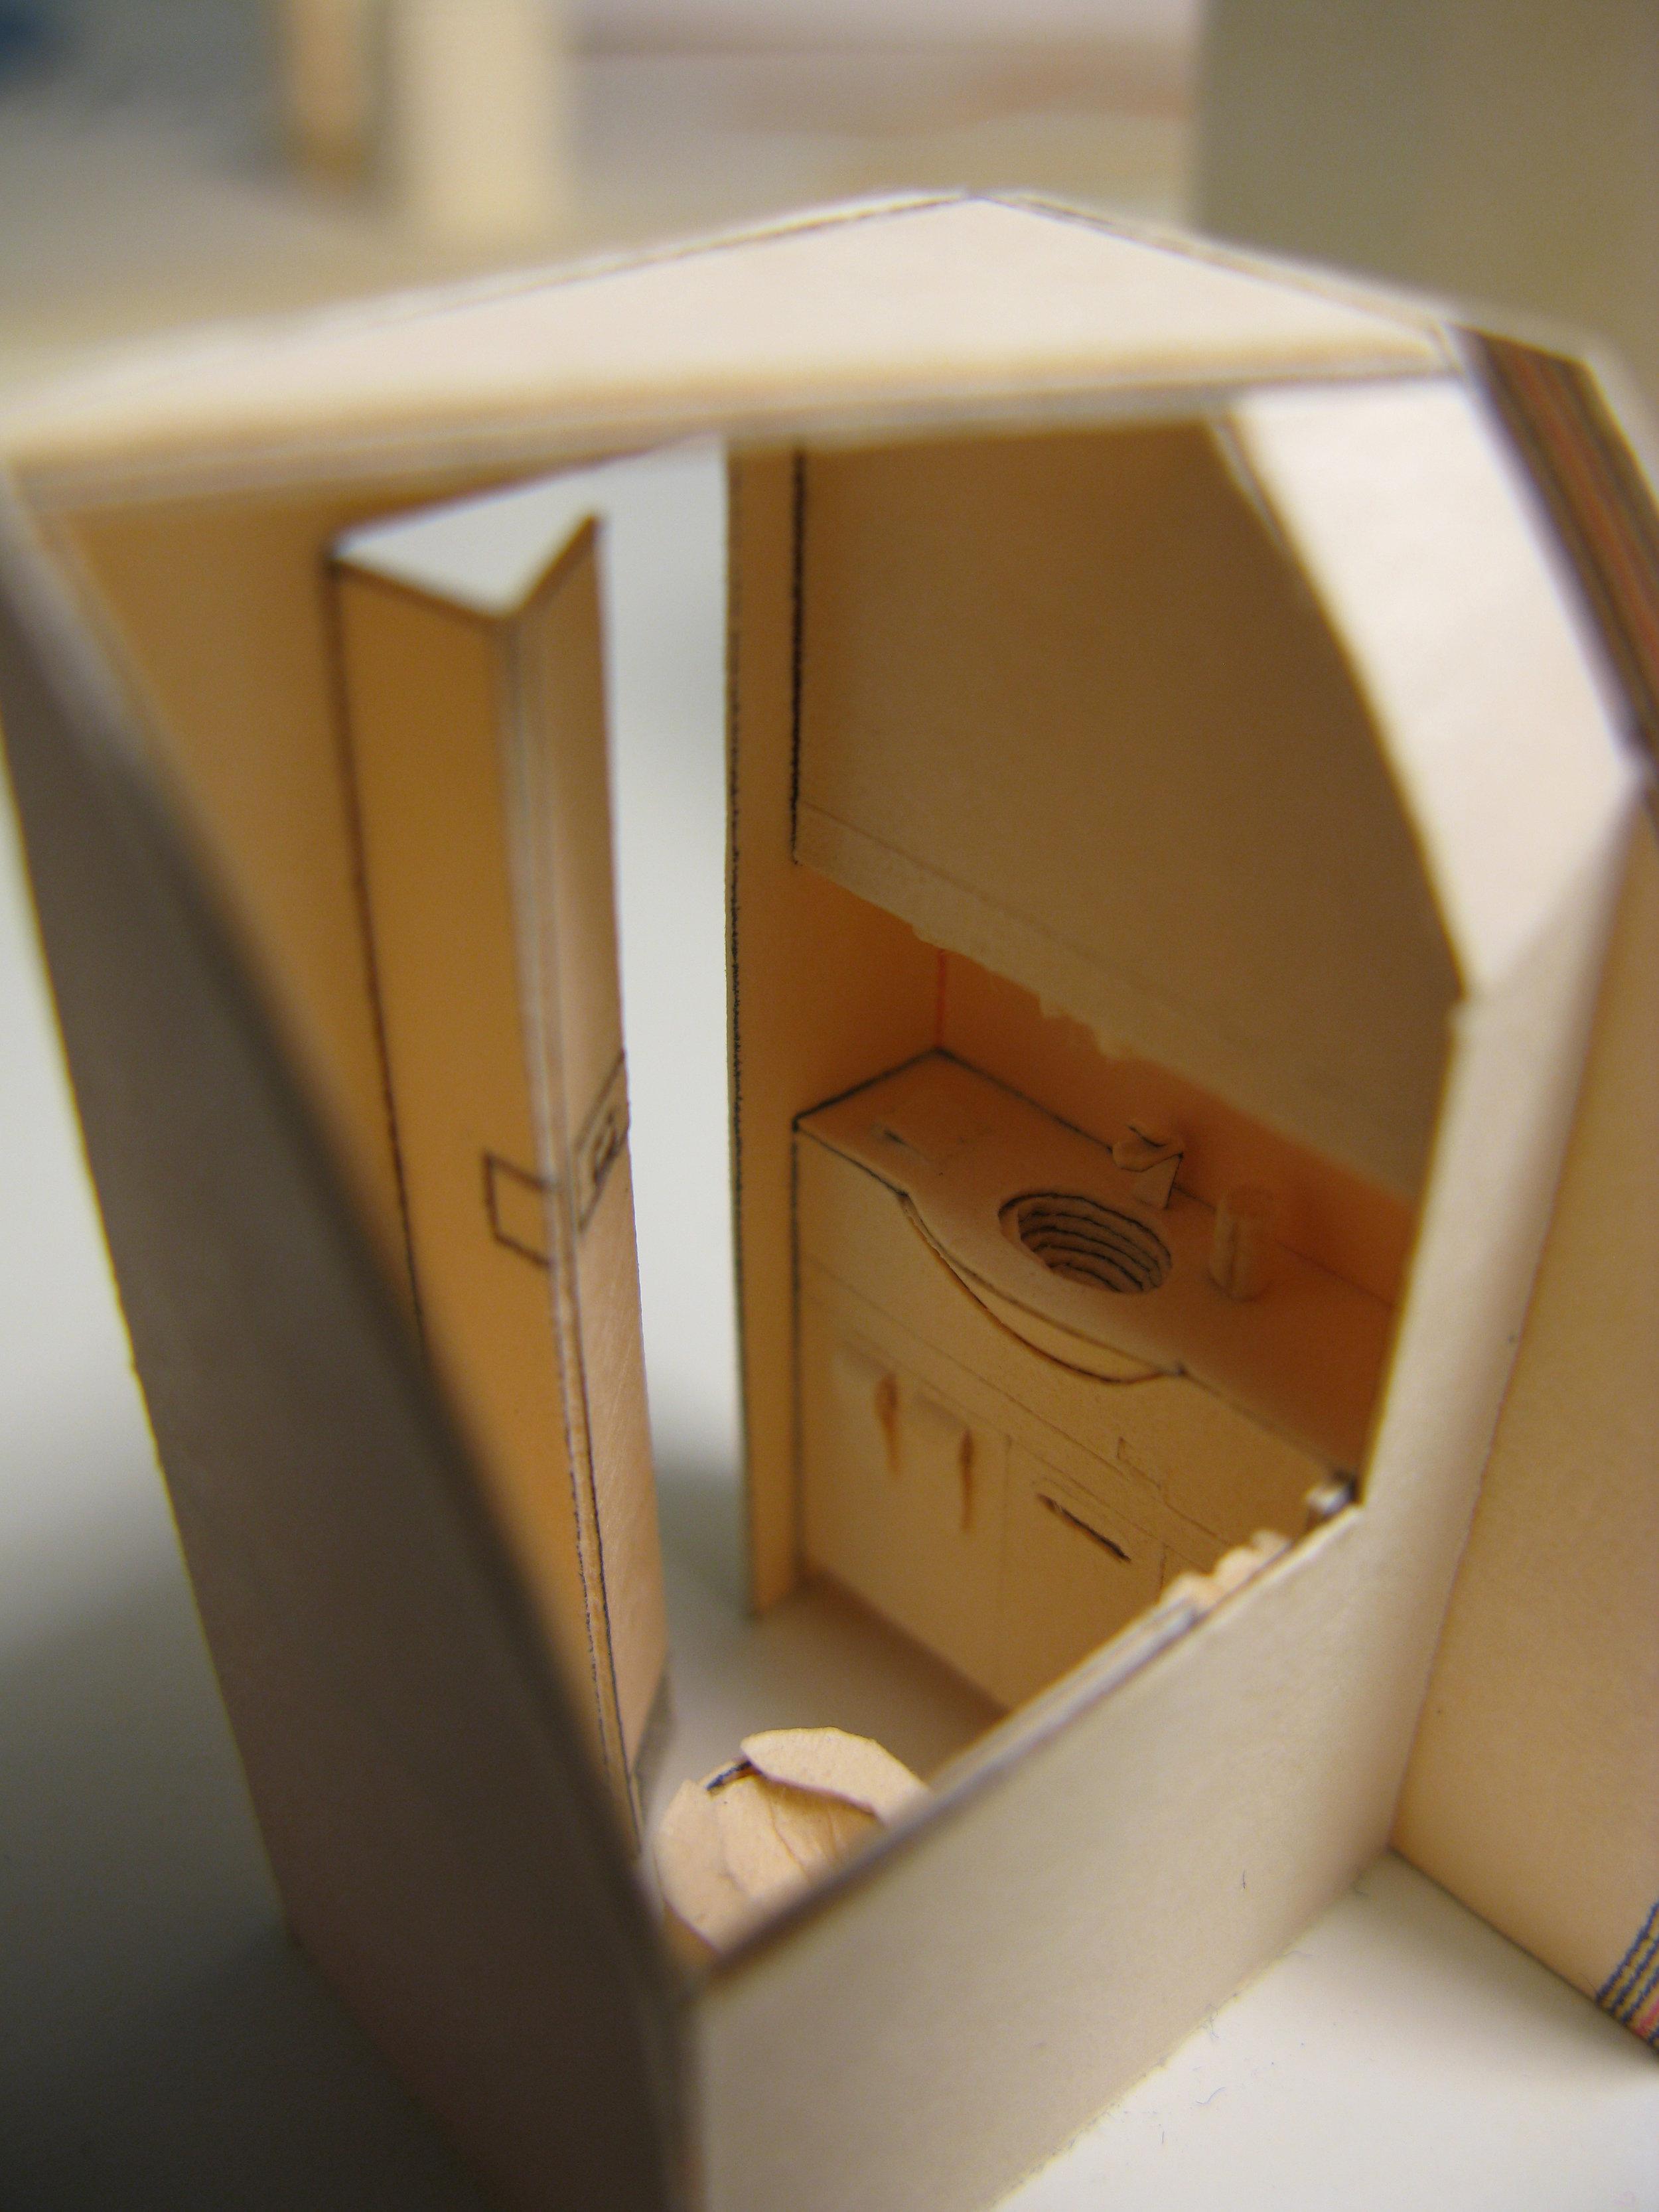 Close-up of a lavatory